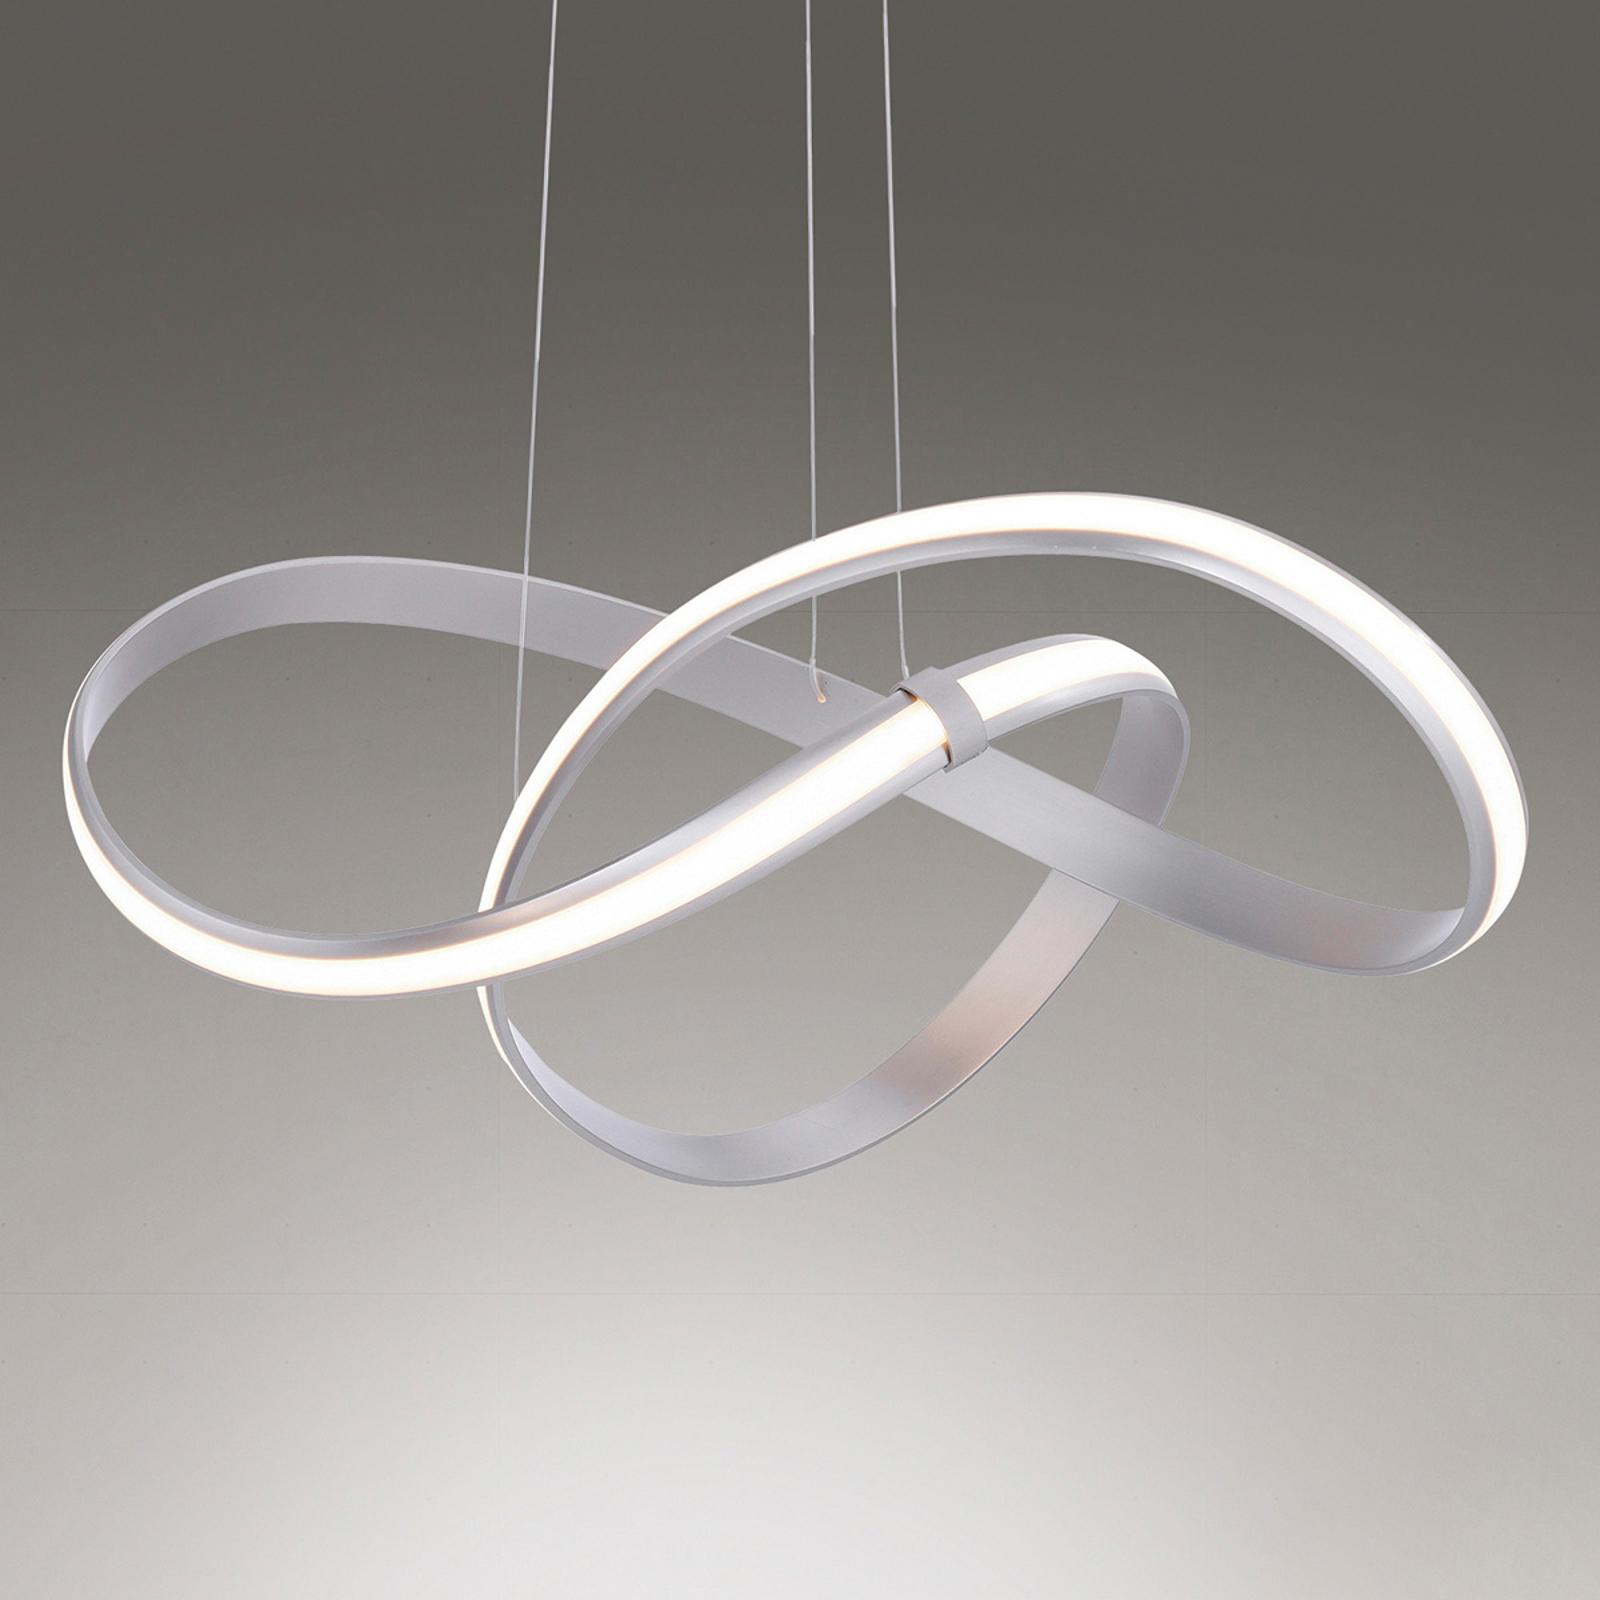 LED-Pendelleuchte Melinda, 30W, dimmbar, stahlgrau